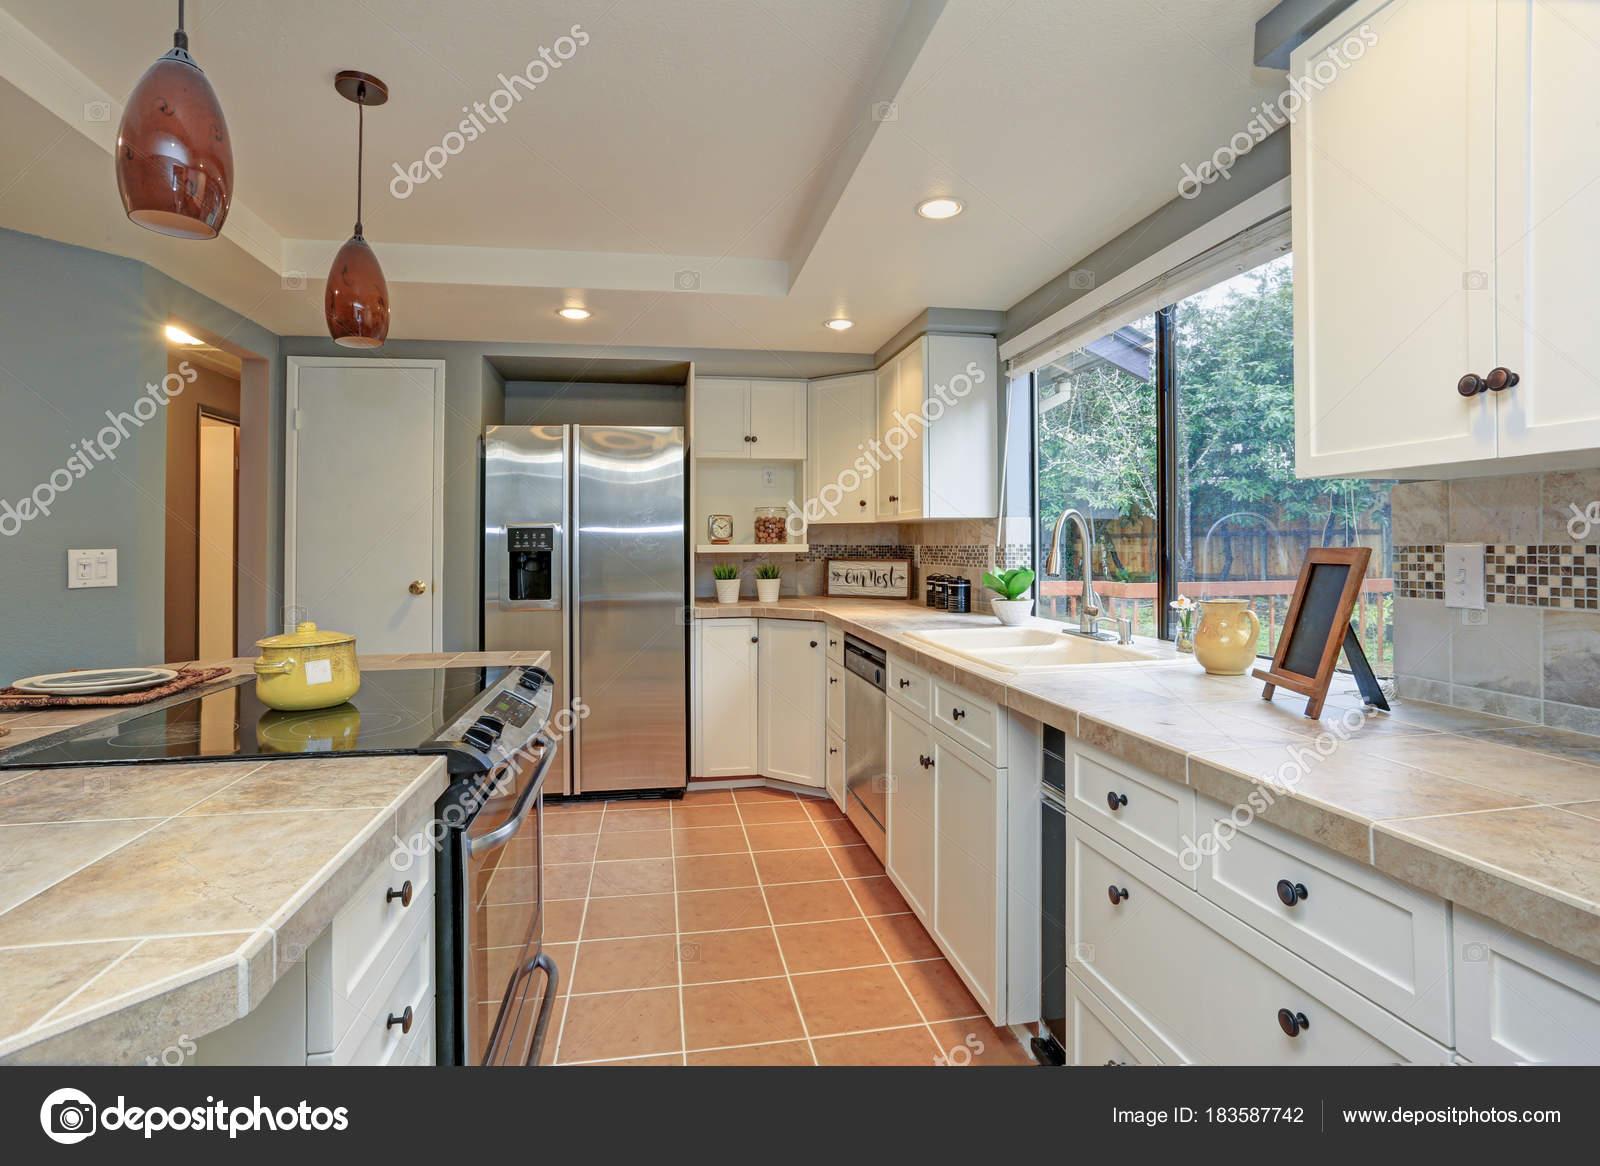 shaker style kitchen backsplash murals 二楼厨房拥有托盘天花板 岛 图库照片 c alabn 183587742 岛和白色振动筛柜 清新的自然色彩营造温馨的氛围 照片作者alabn